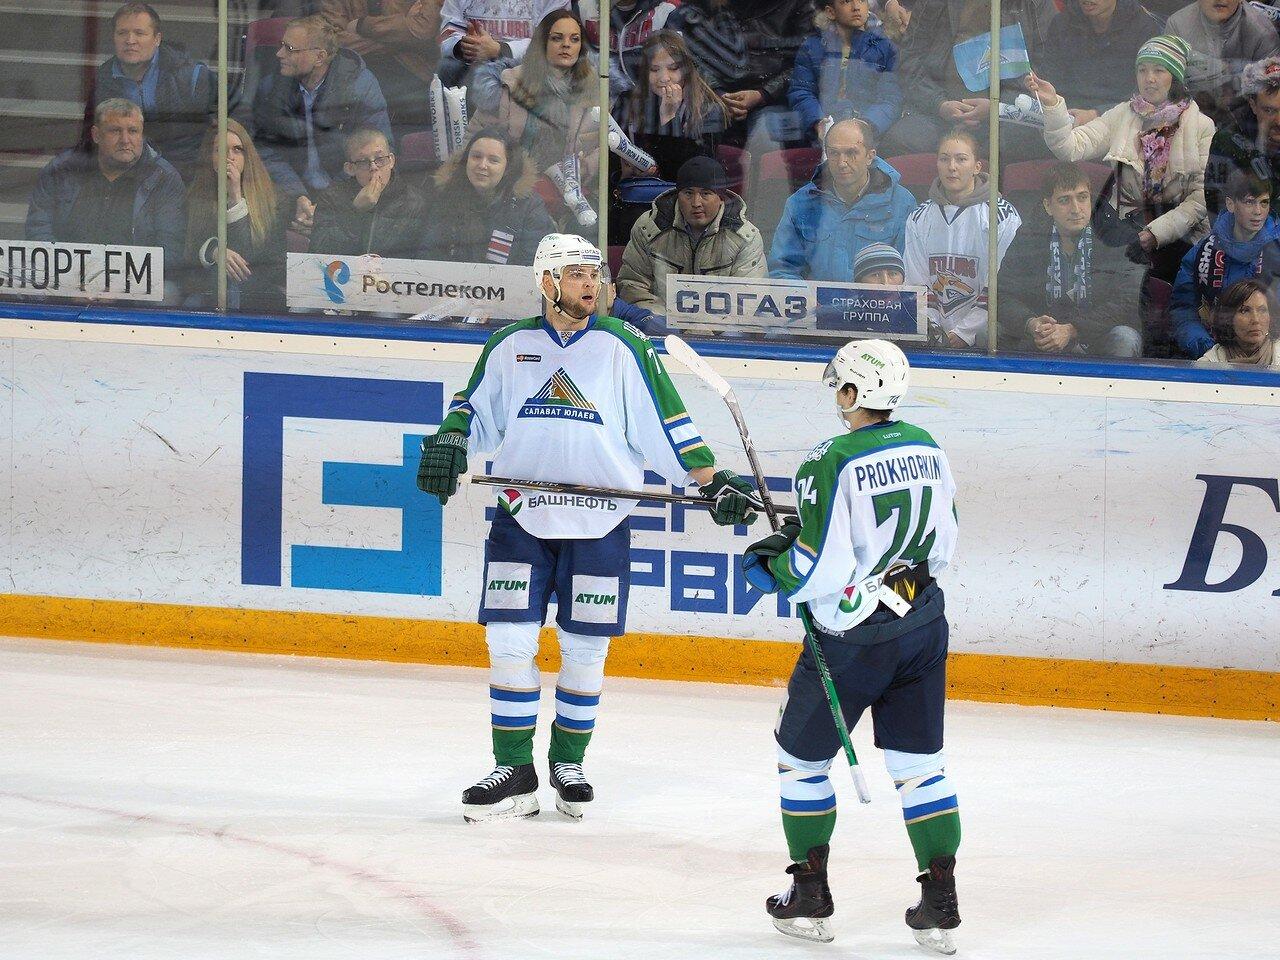 105Плей-офф 2016 Восток Финал Металлург - Салават Юлаев 23.03.2016